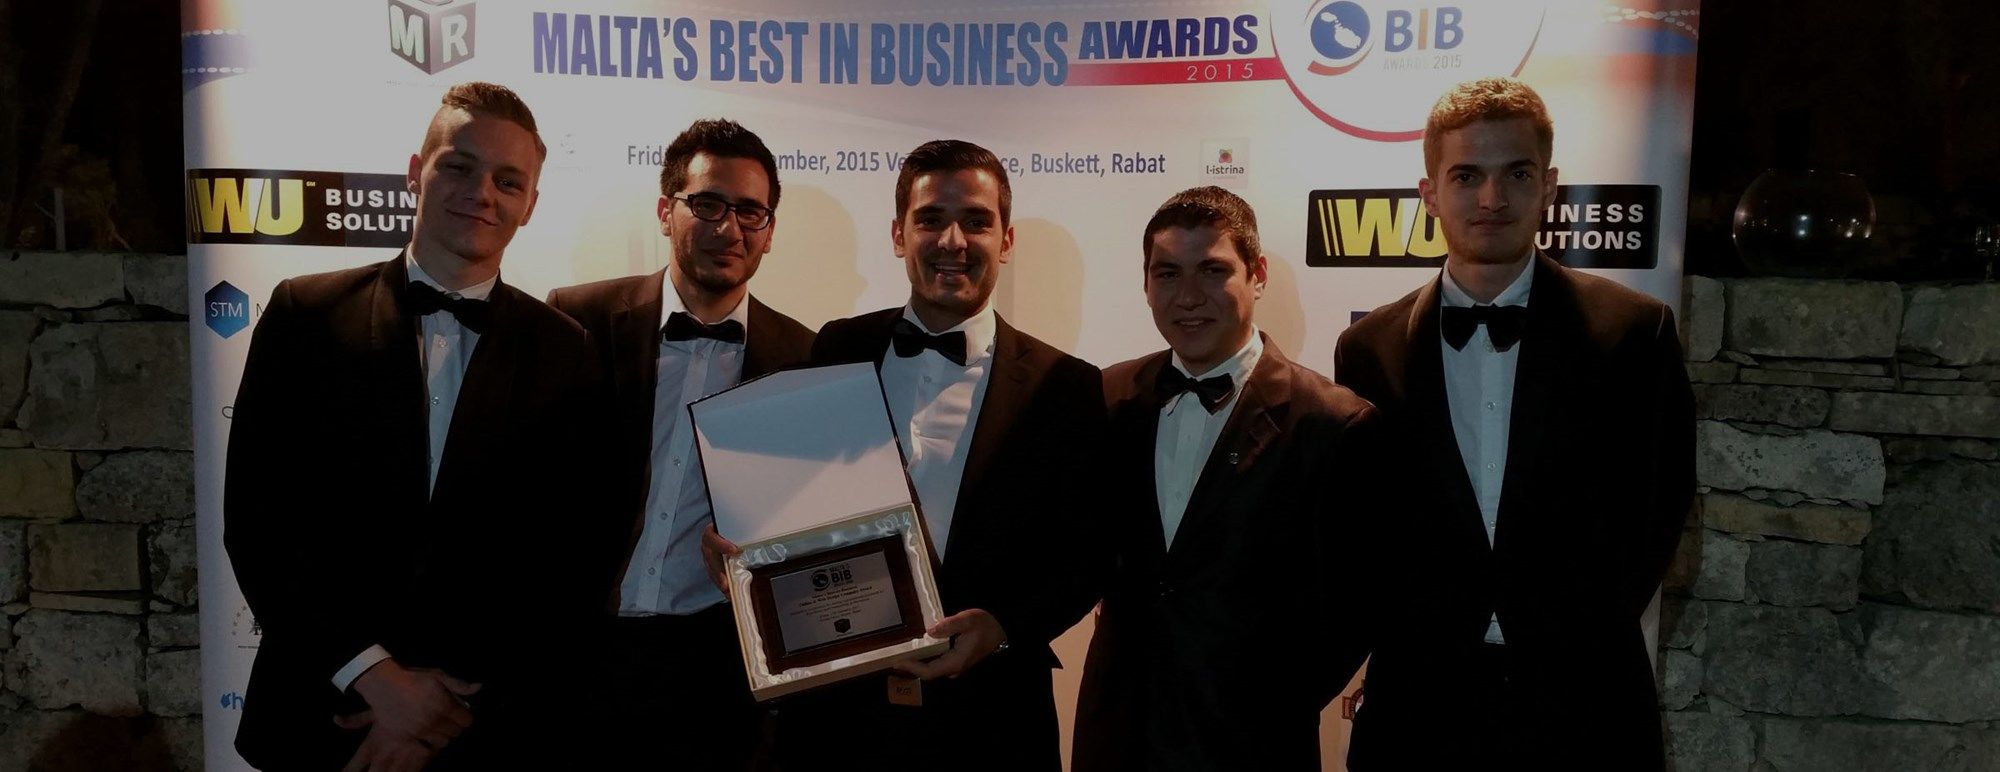 CasaSoft Interviewed in Malta Business Review on achieving Malta's Best In Business Online & Web Design Agency | CasaSoft Ltd. Malta